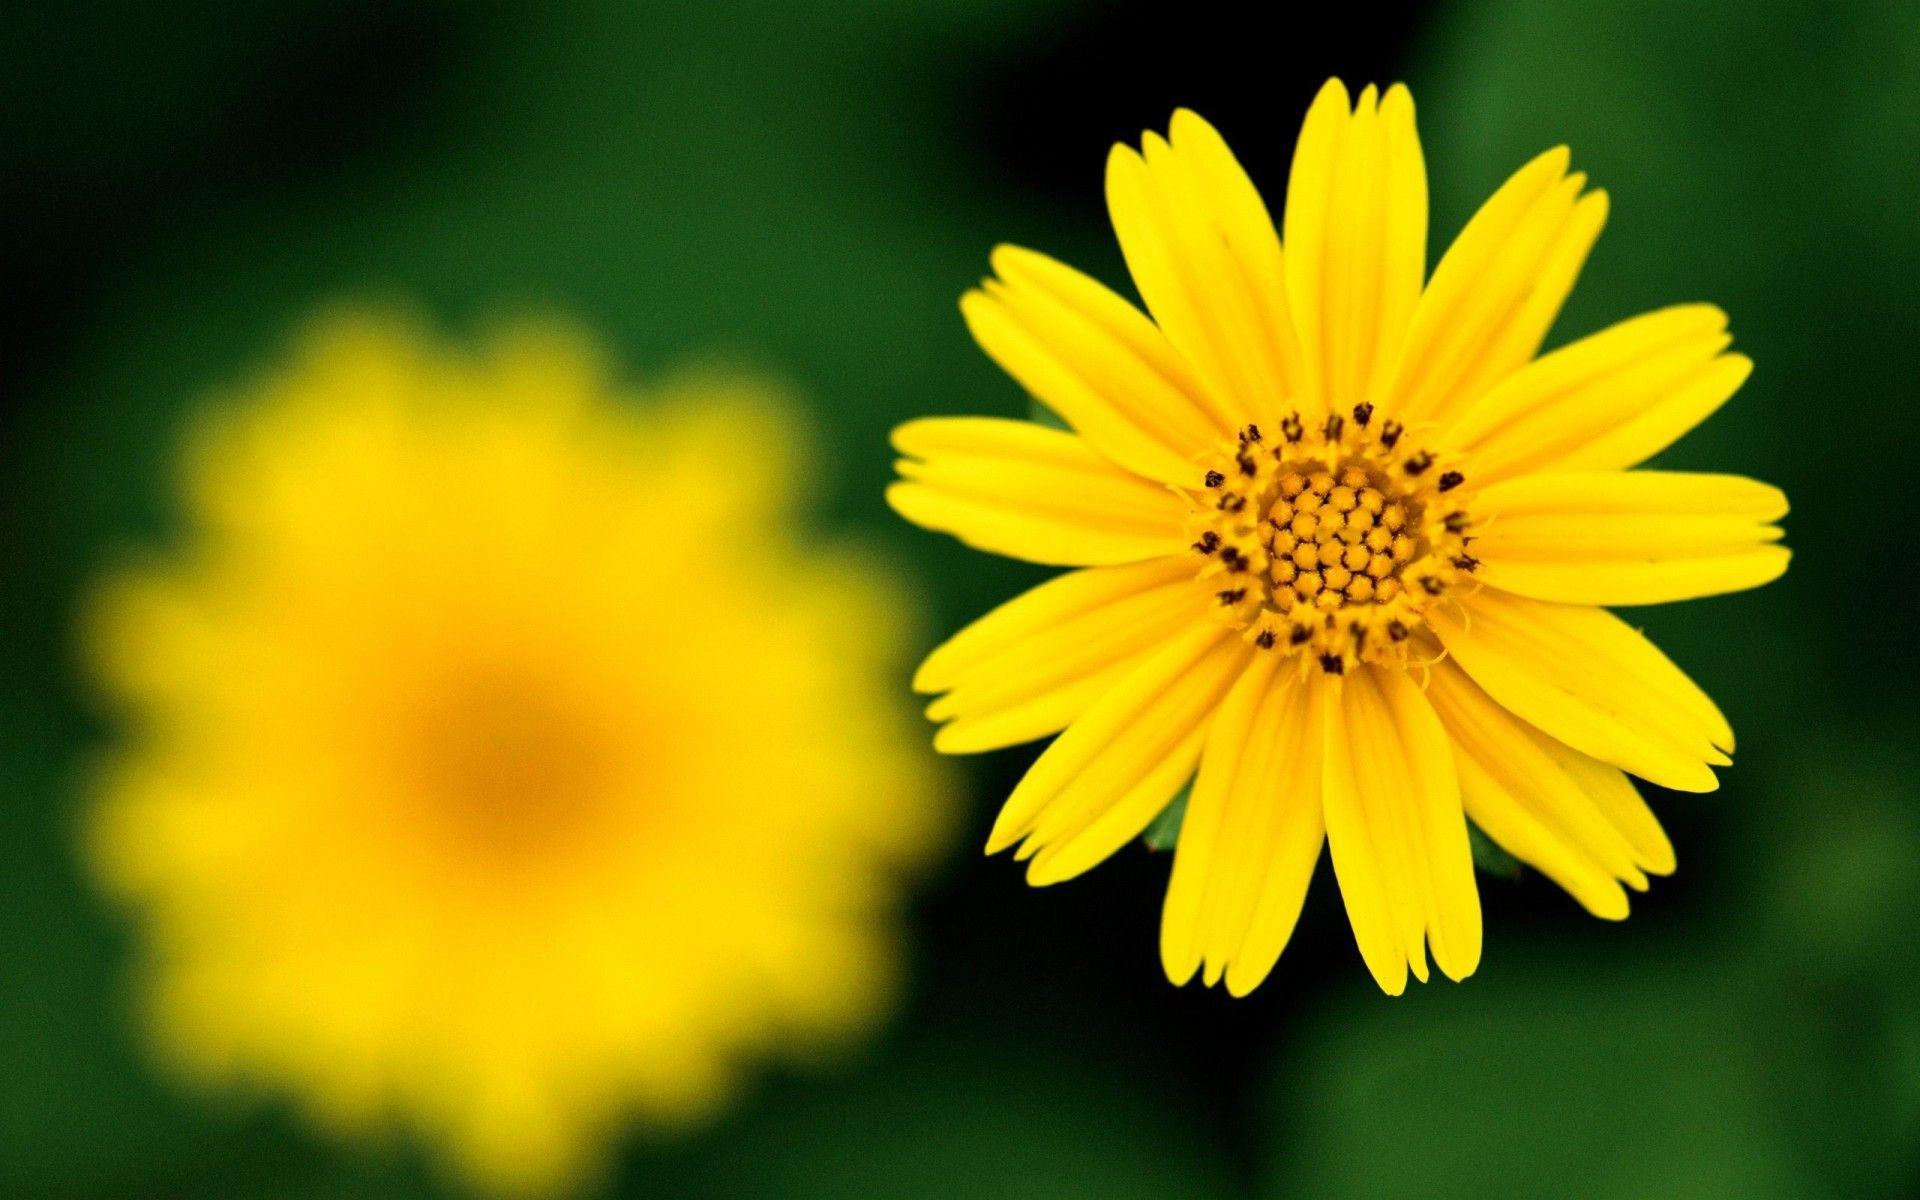 Скорби памяти, картинки с желтыми цветами